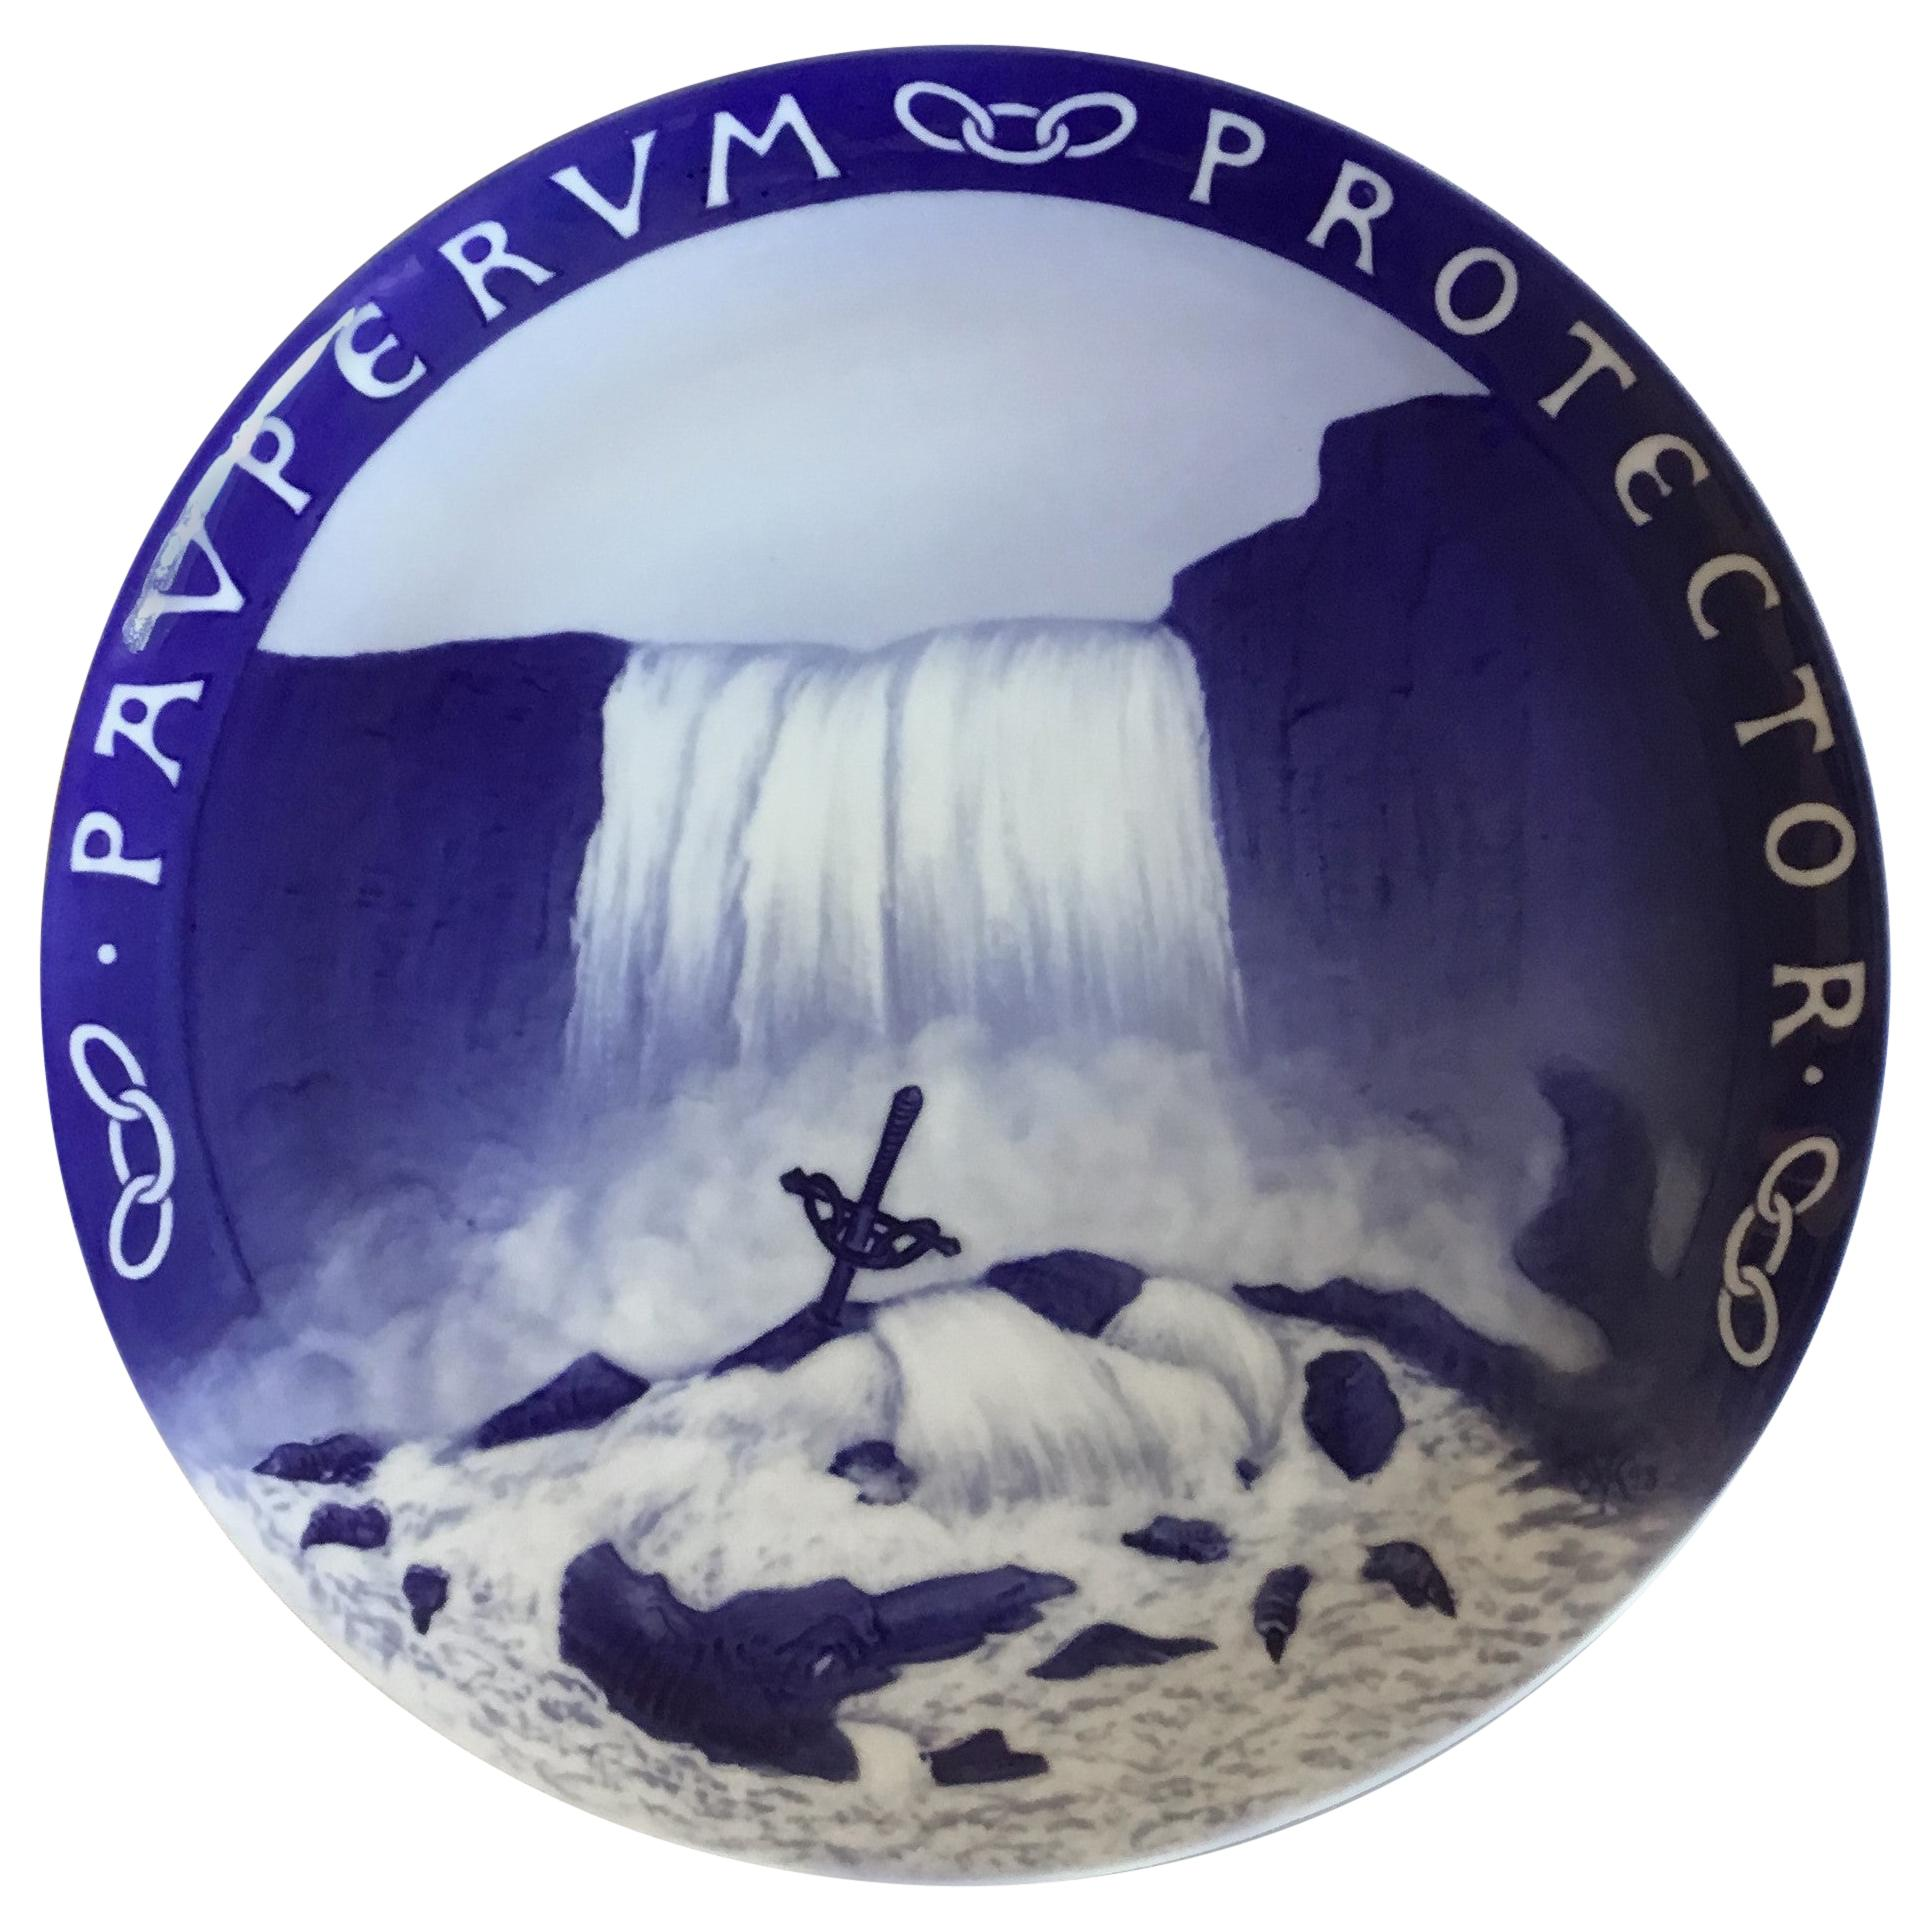 Royal Copenhagen Commemorative Plate from 1899 RC-CM31